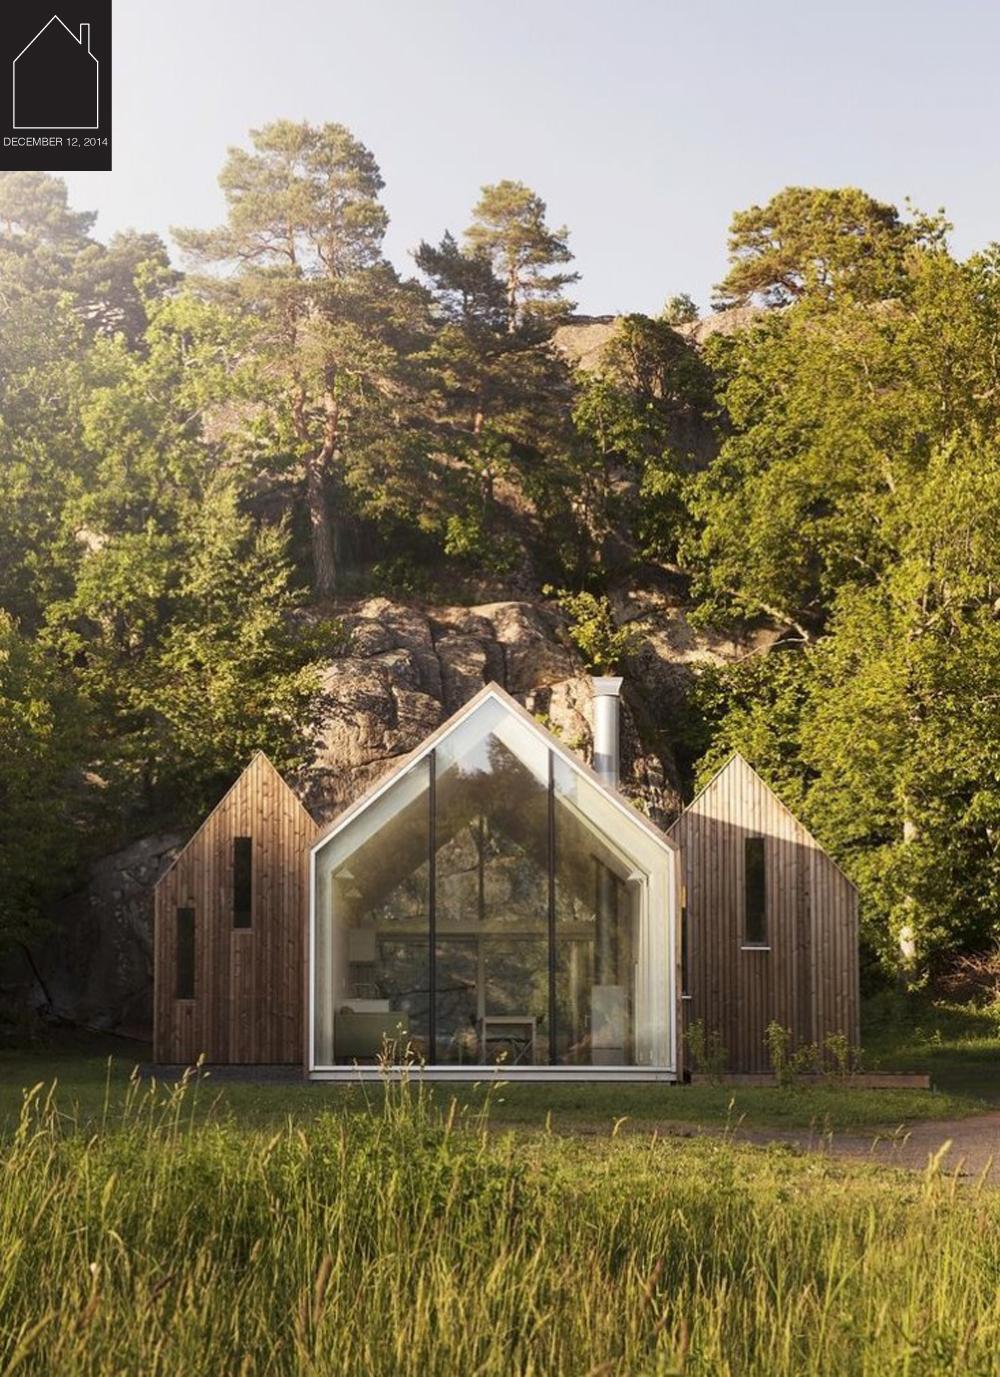 cabins in Norway designed by  Reiulf Ramstad  via  GARDENISTA